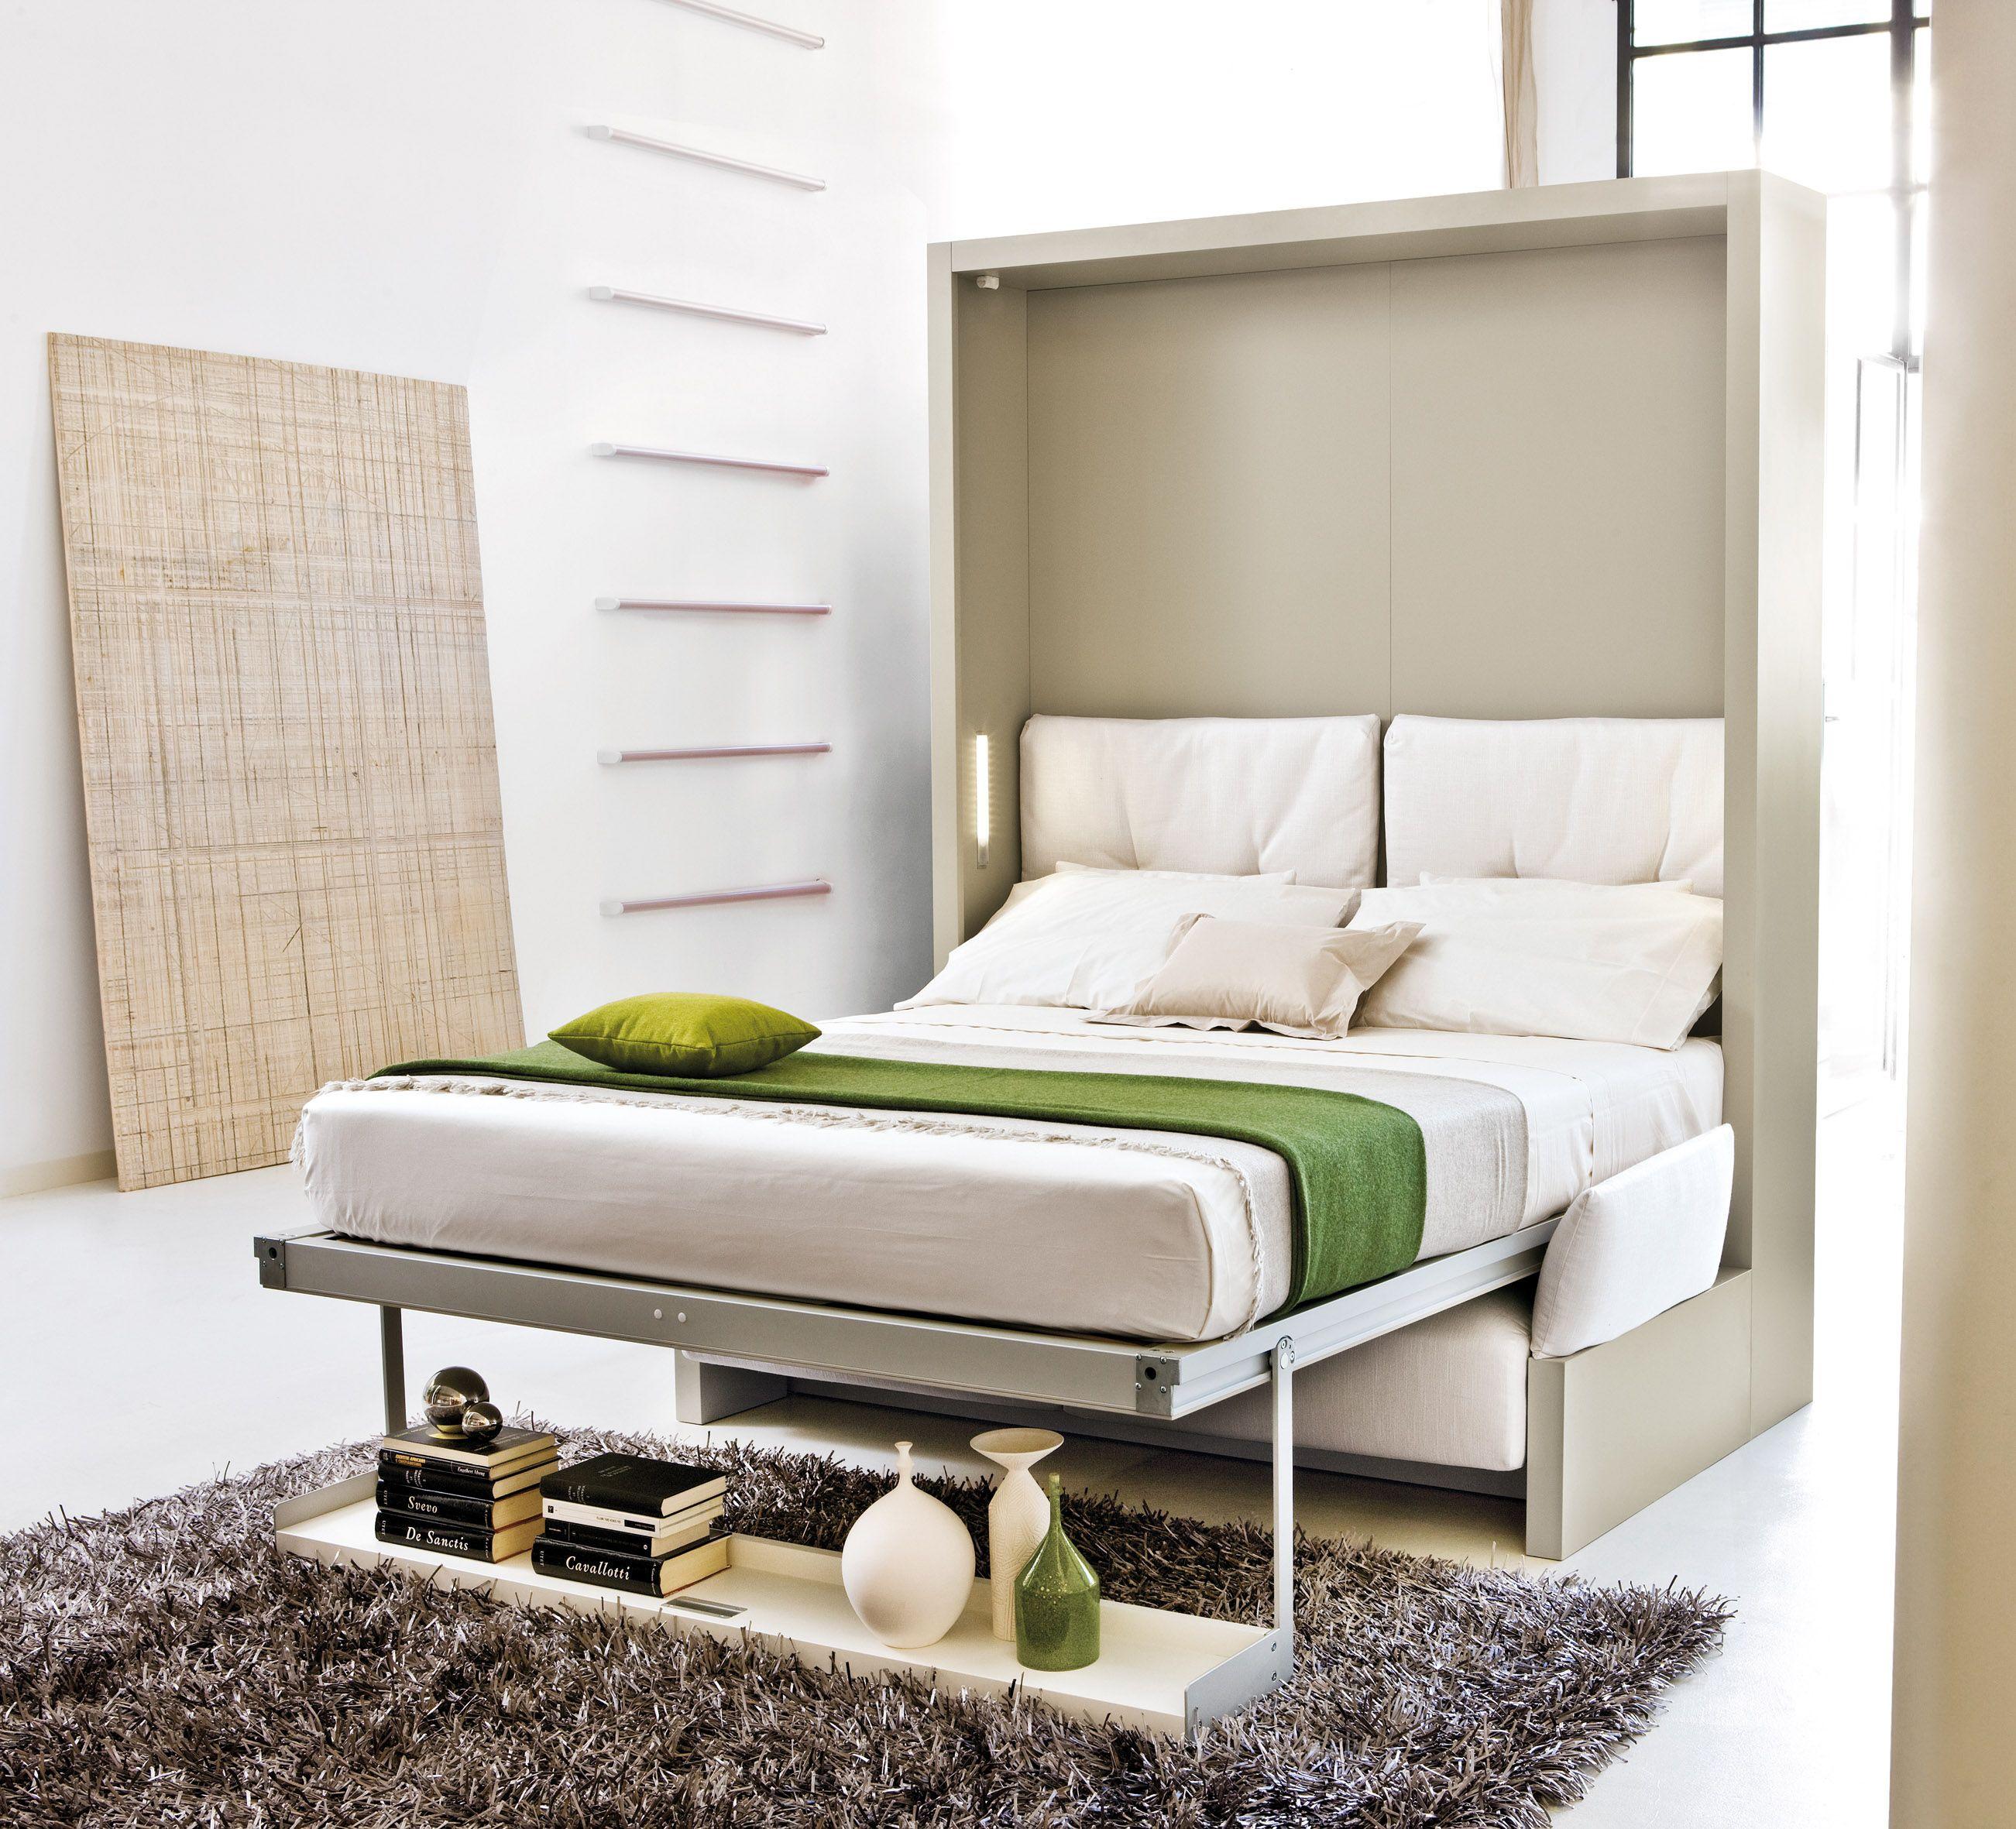 NuovoLiola - Multifunktionsbett | Organizing | Pinterest | Small ...